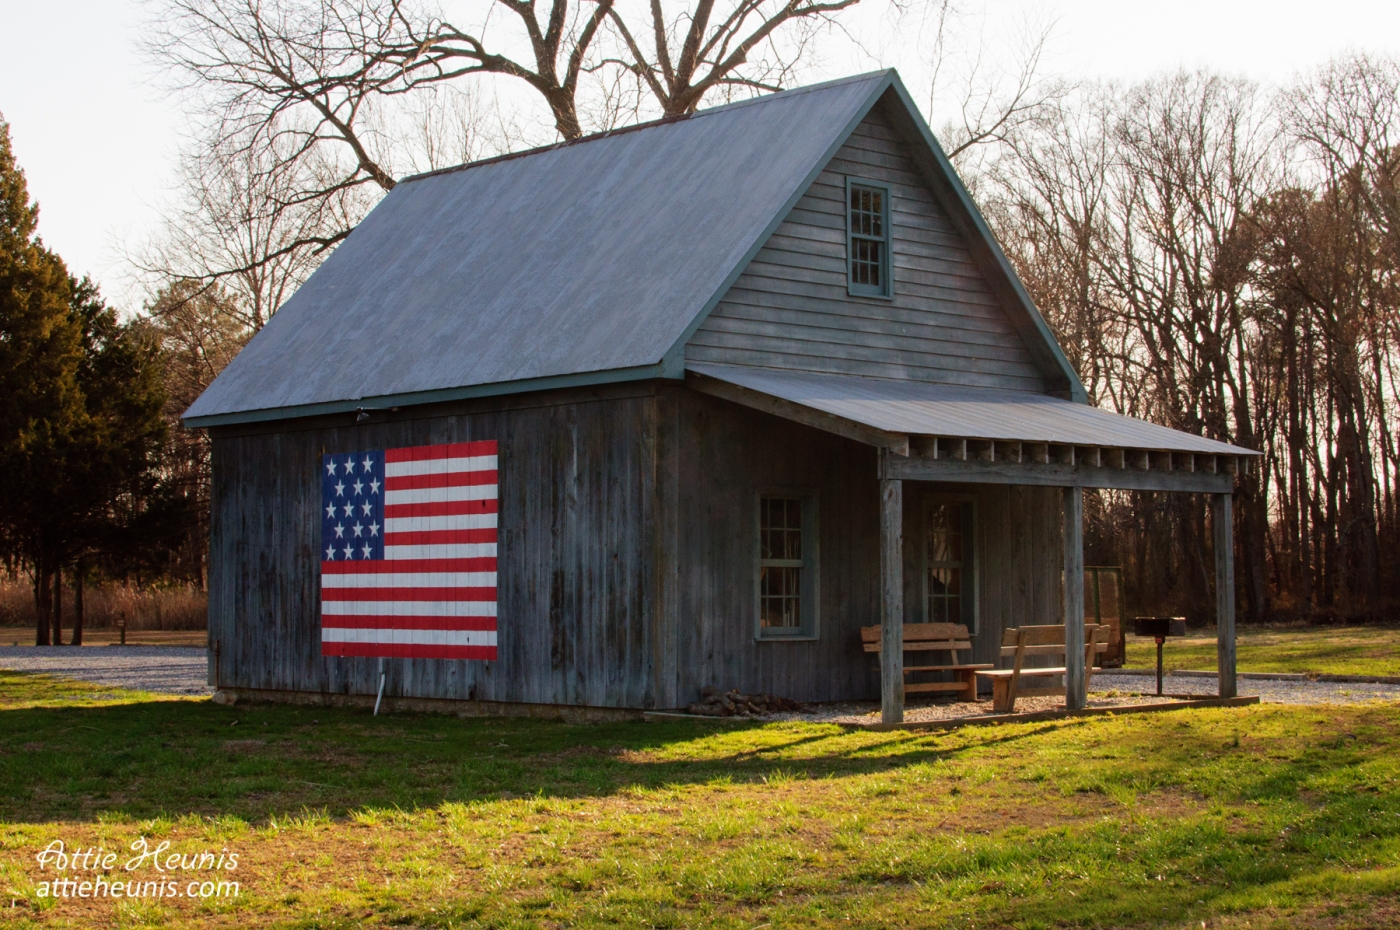 USA flag on cabin